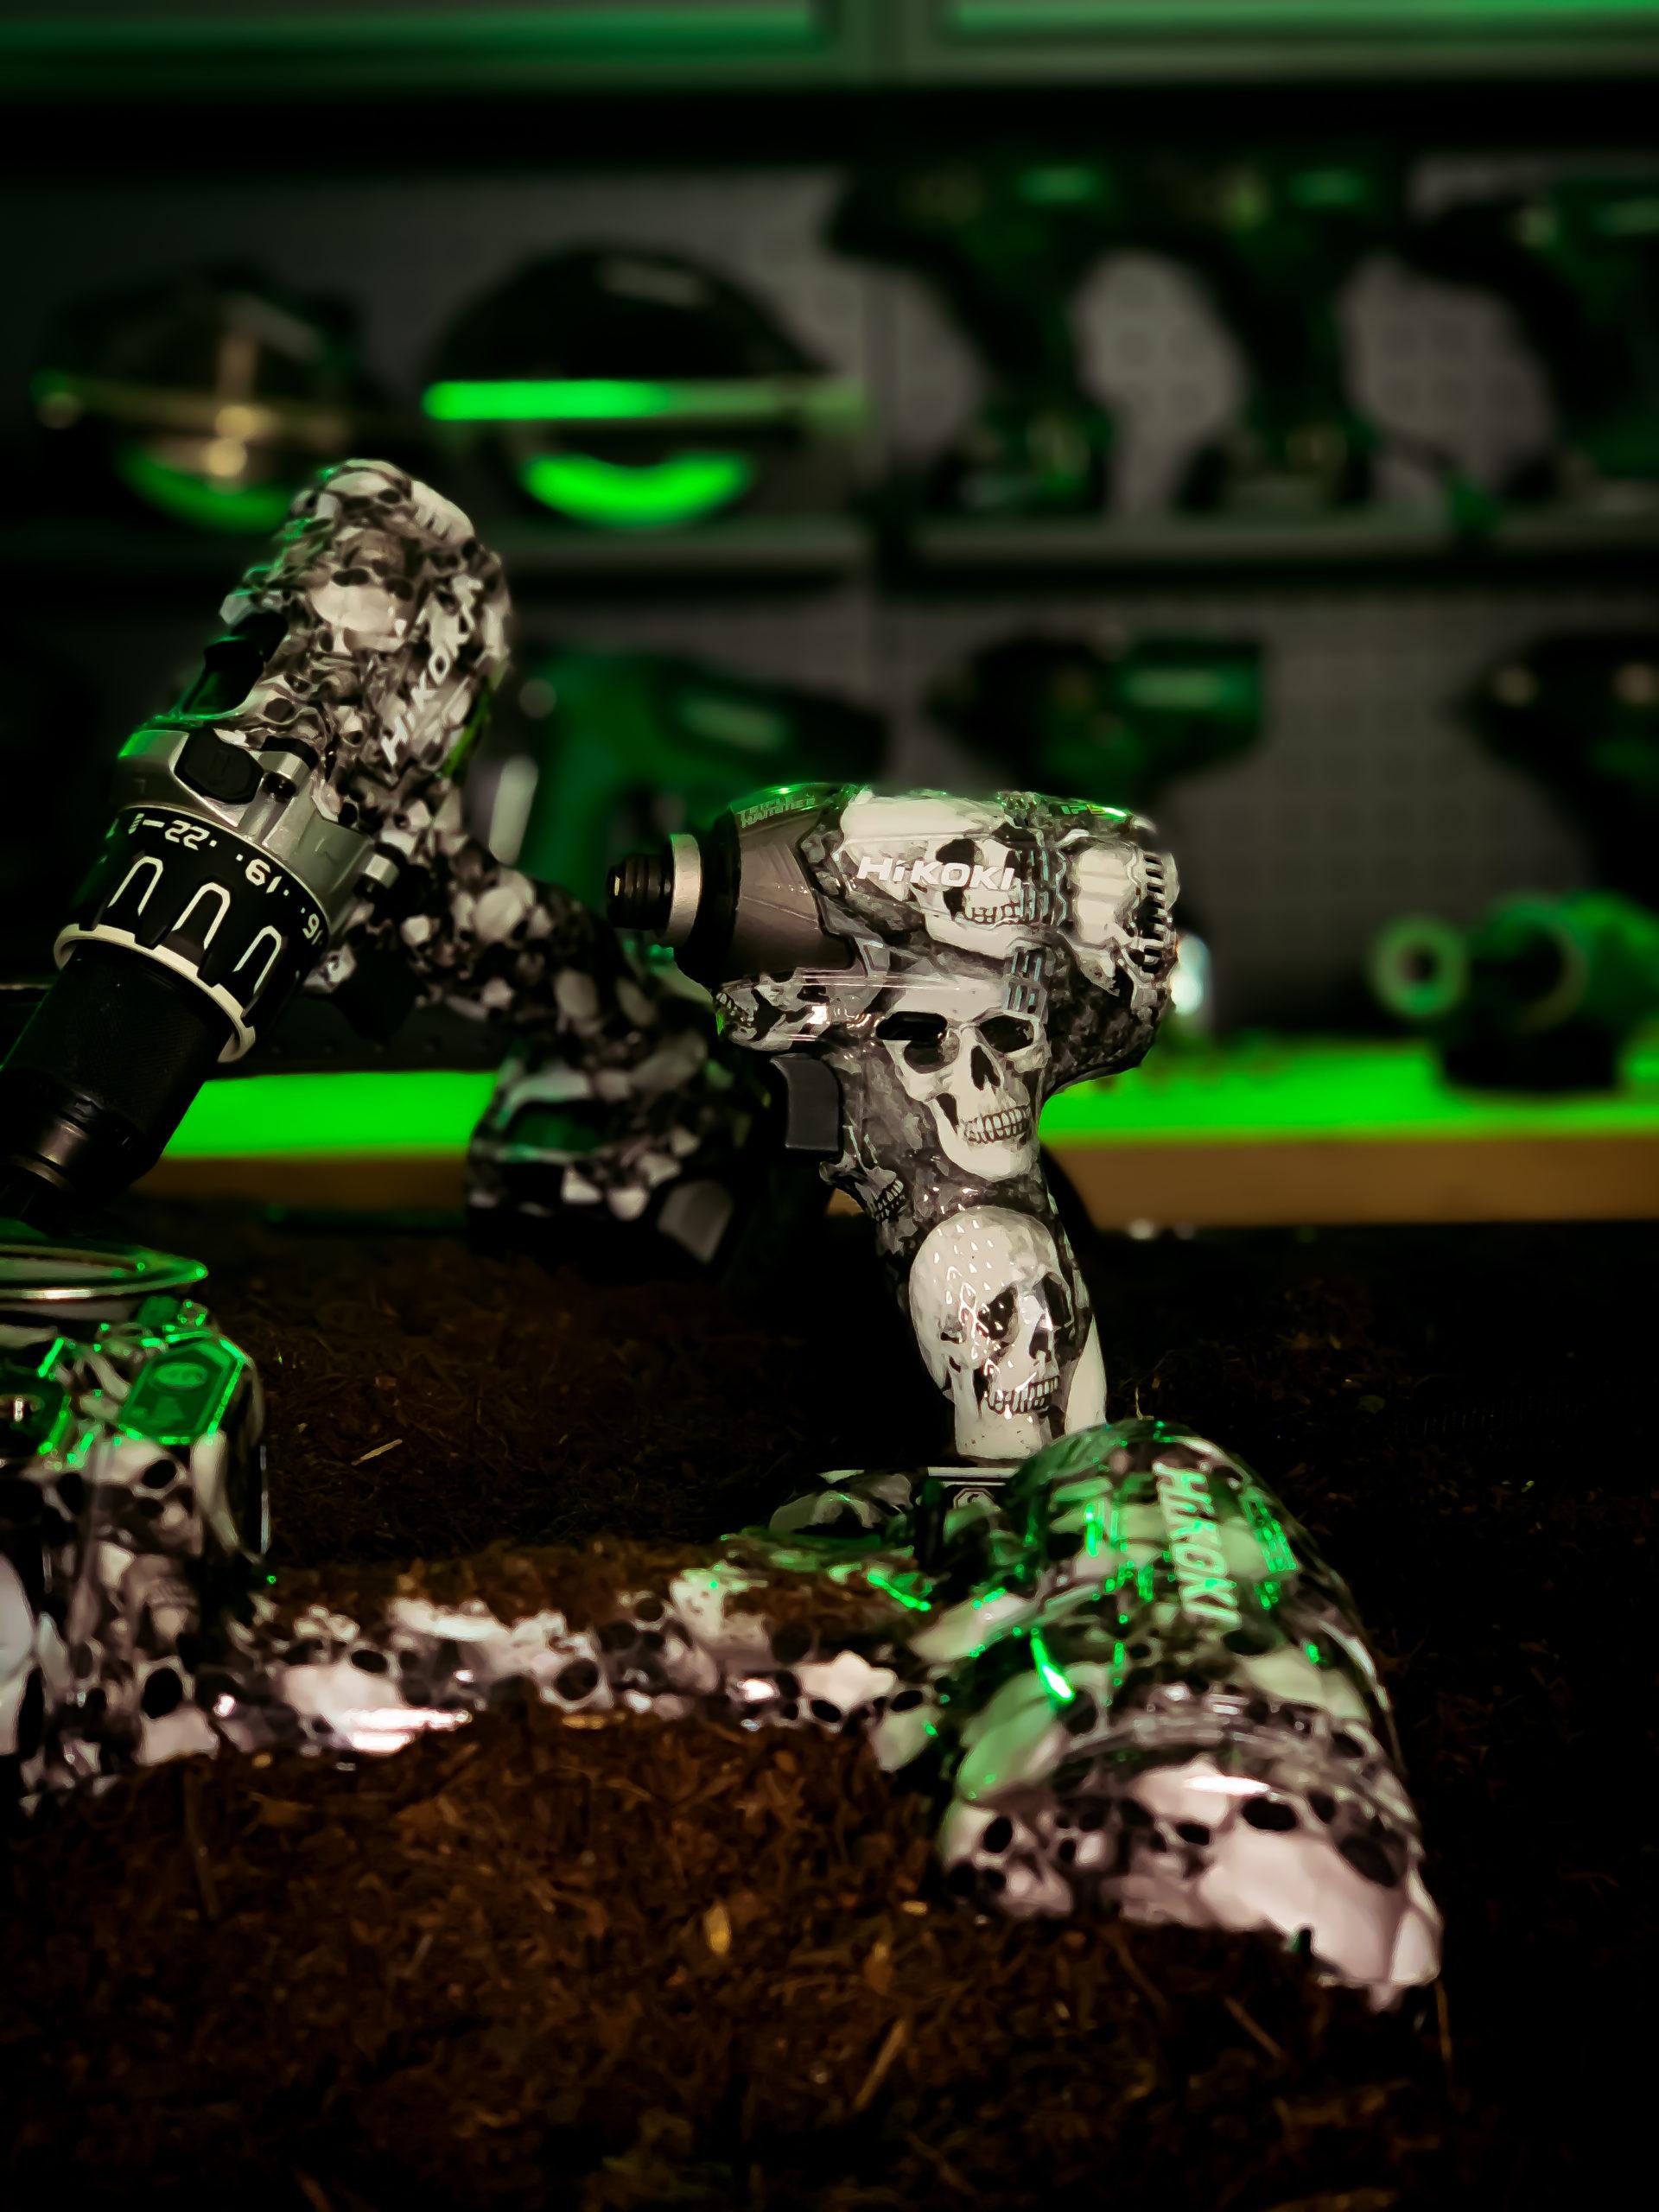 HiKOKI Power Tools UK launches collectible Limited Edition SKULL 'Catacomb' range